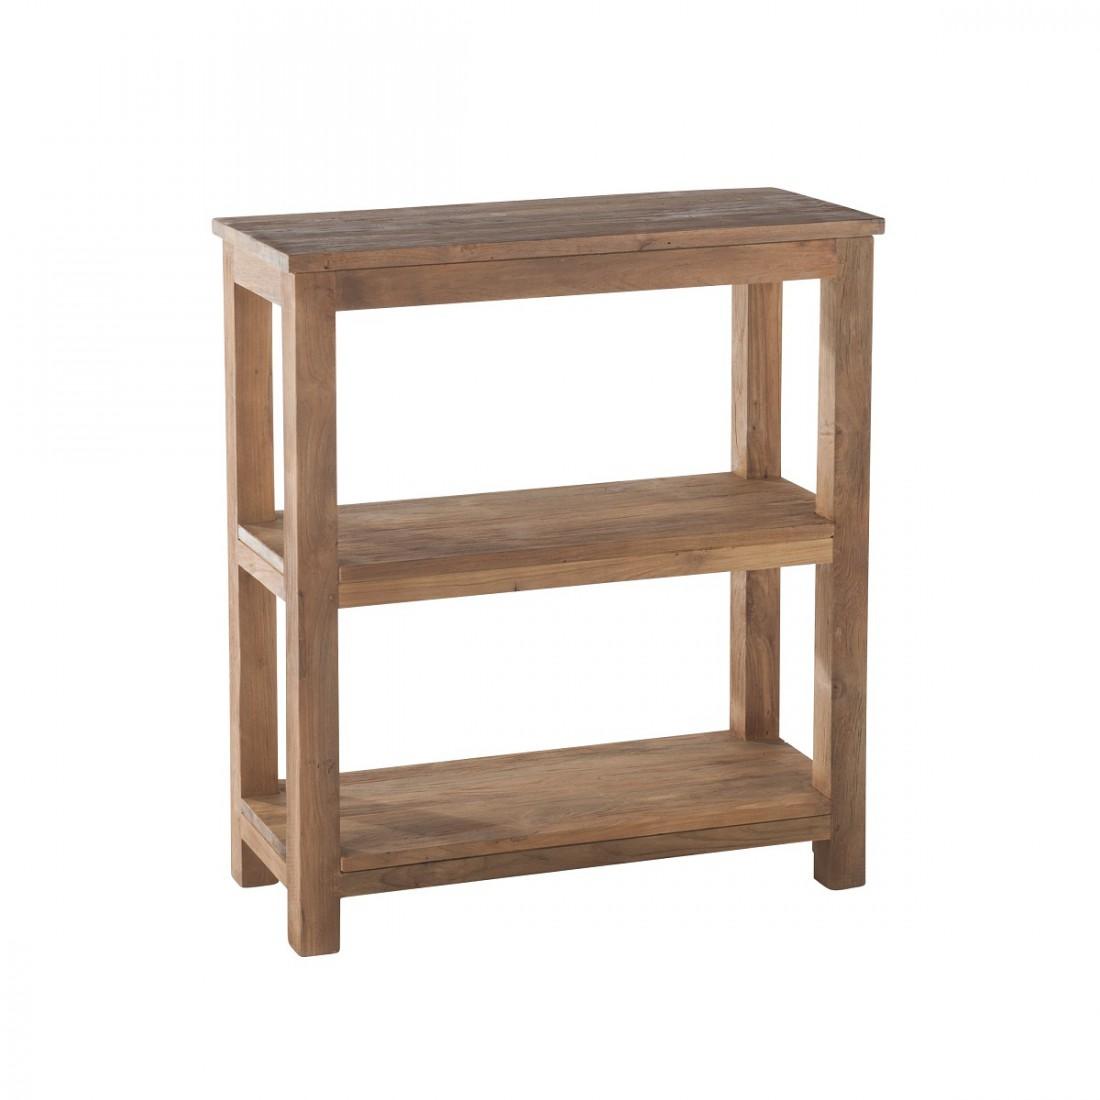 Fine 3 Levels Teak Shelf Drift Inzonedesignstudio Interior Chair Design Inzonedesignstudiocom